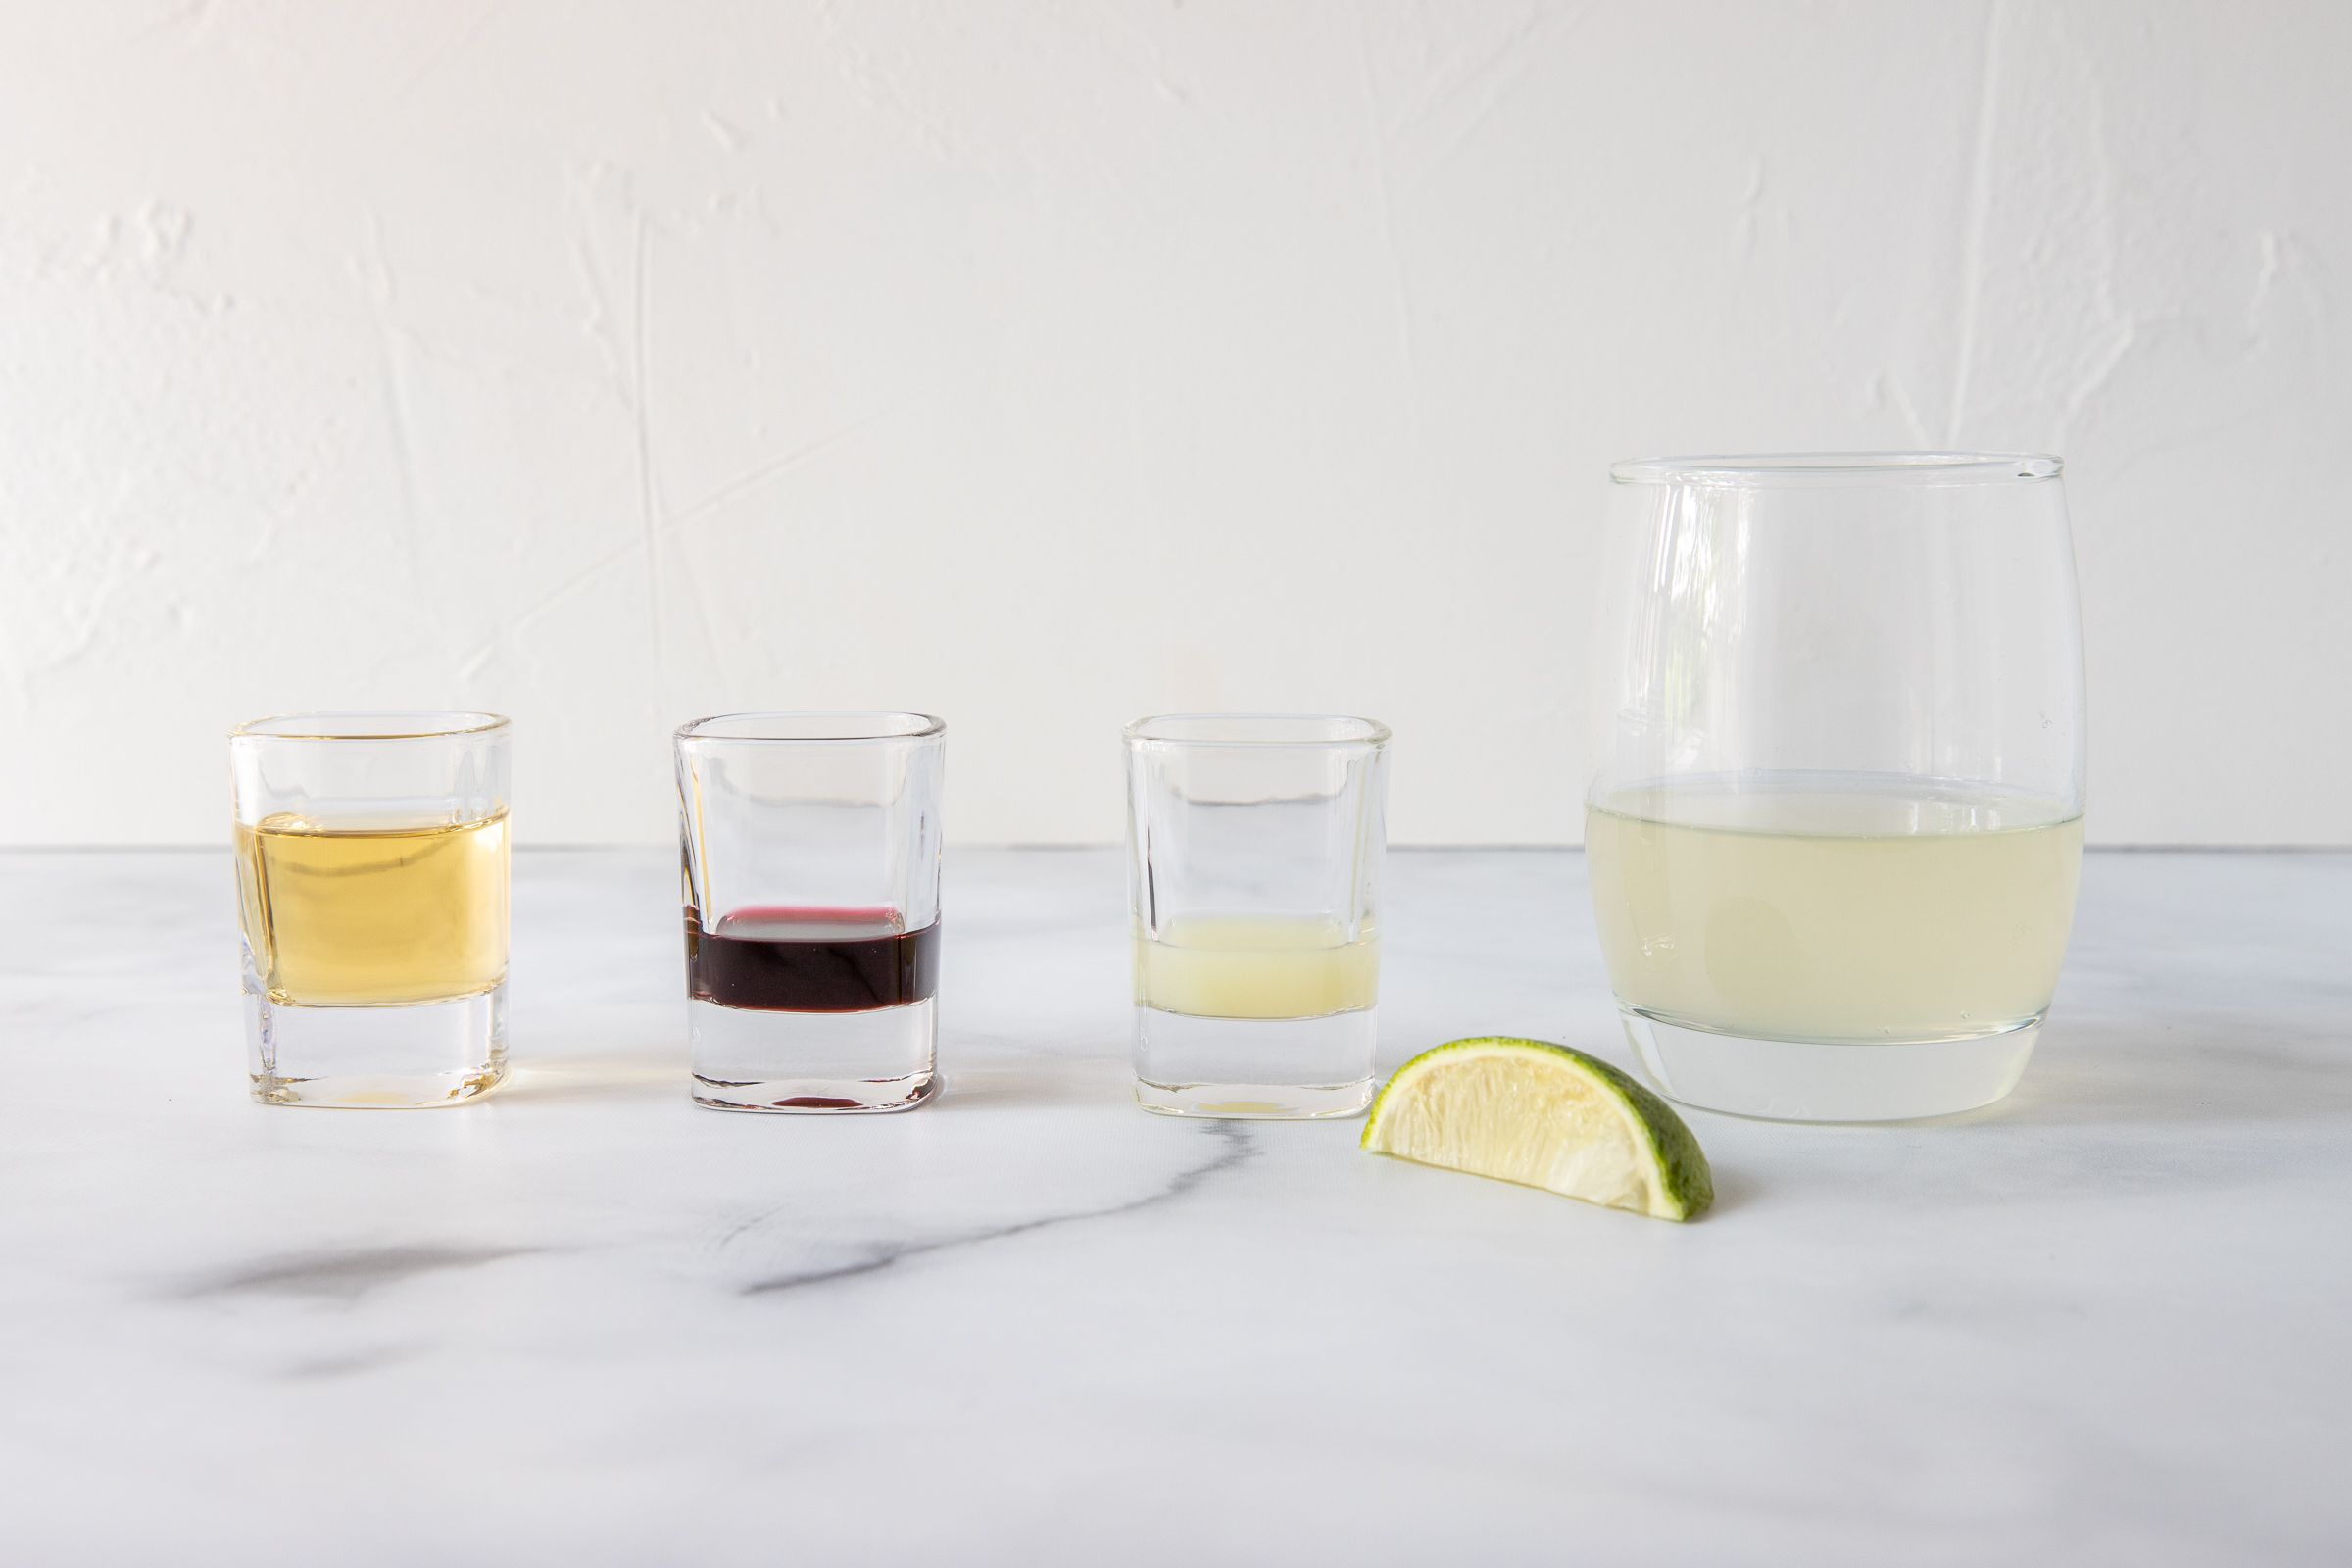 El Diablo Cocktail ingredients